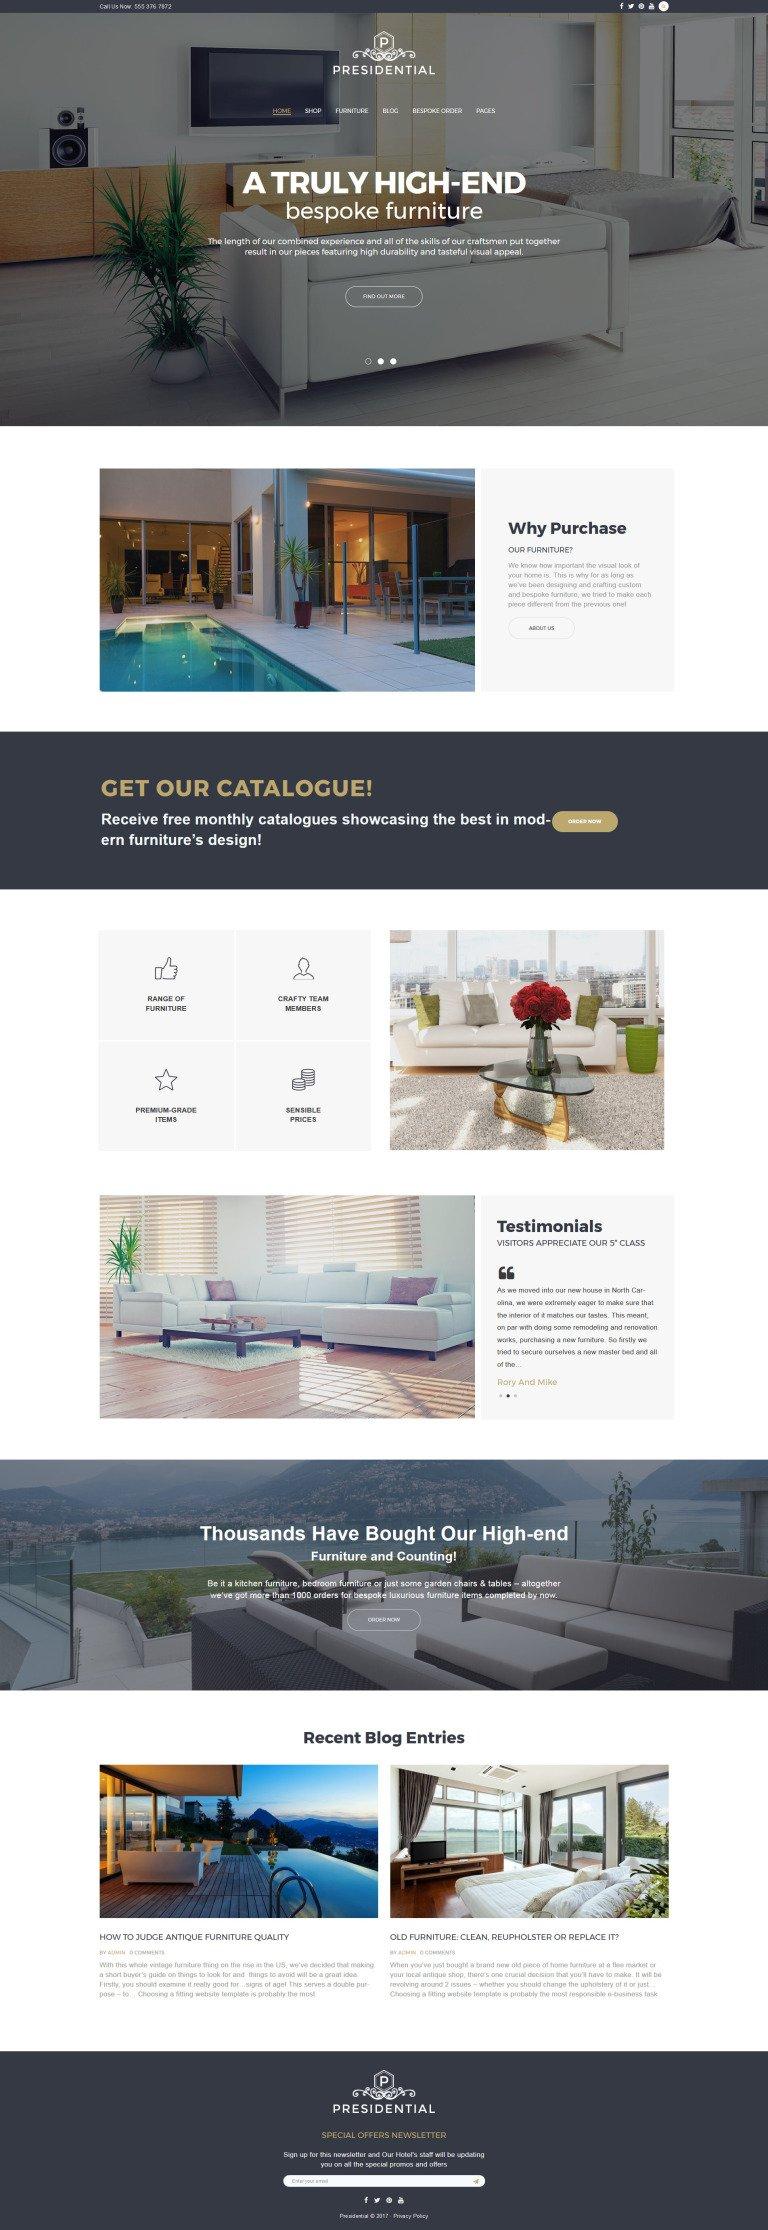 Presidential - Home Decor & Furniture WordPress Theme New Screenshots BIG